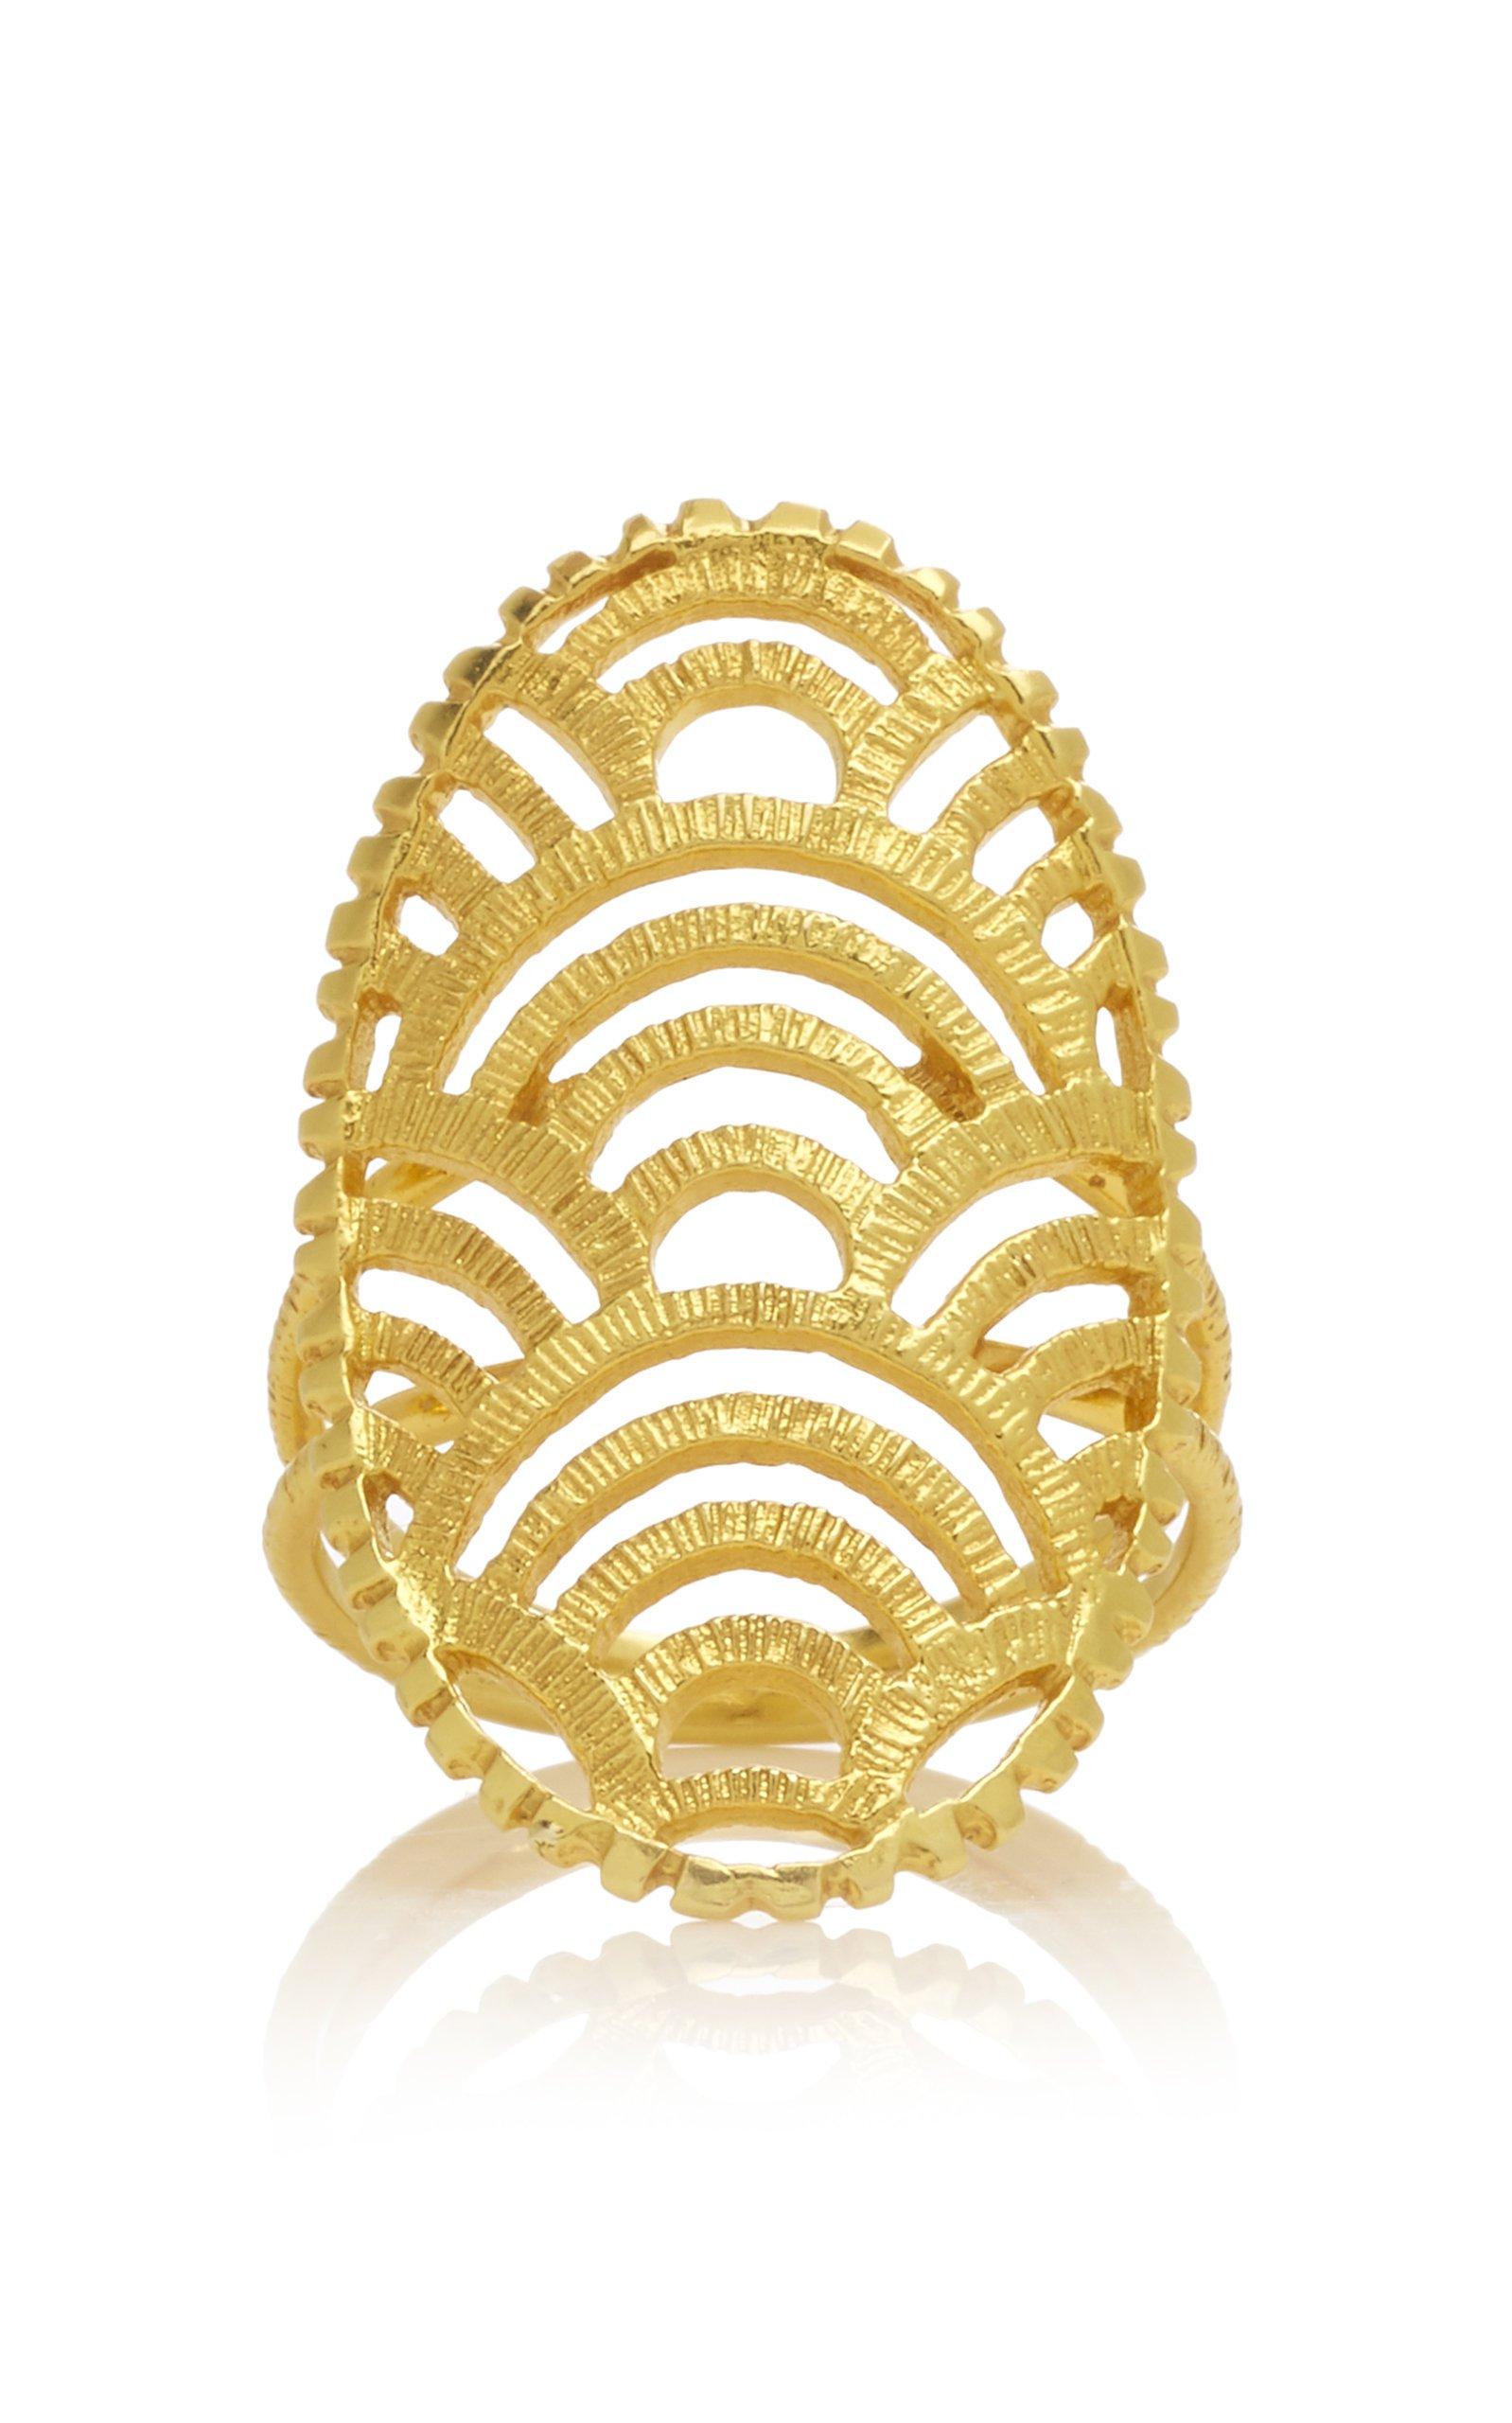 Ilias Lalaounis 18K Gold Nubia Shield Ring